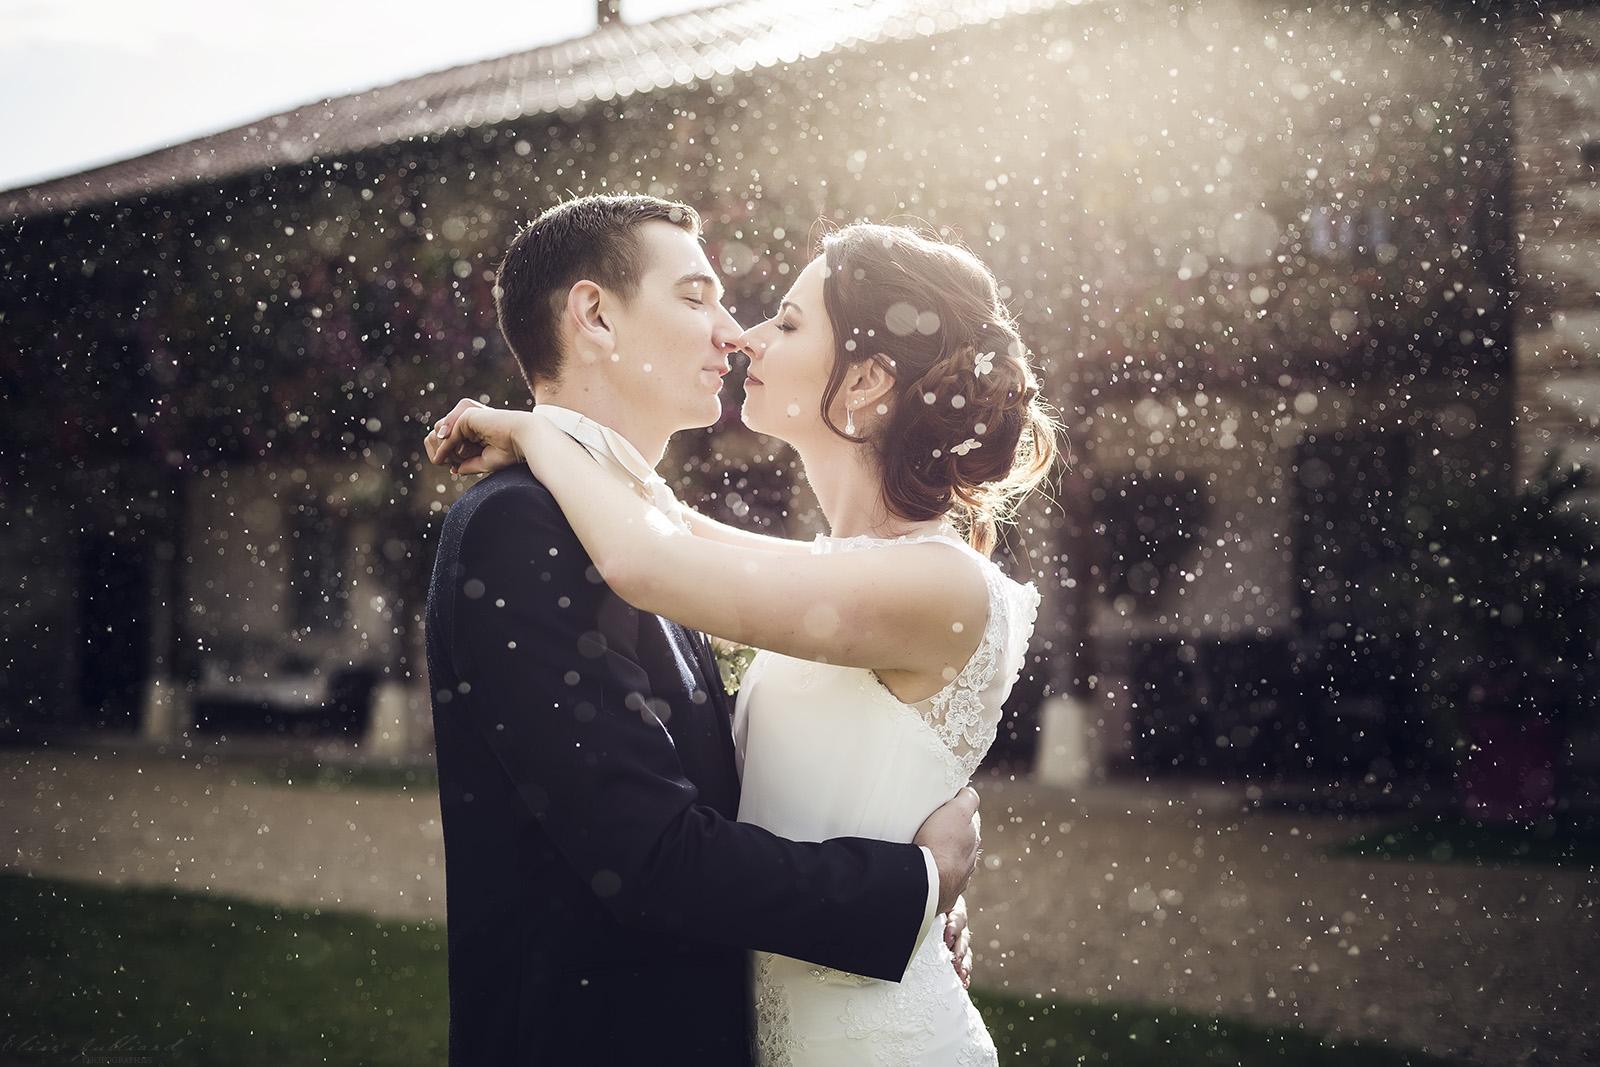 photo-reportage-mariage-bourg-en-bresse-ain-dombes-wedding-auvergne-rhone-alpes-seance-couple-love-session-elise-julliard-photographe-lyon